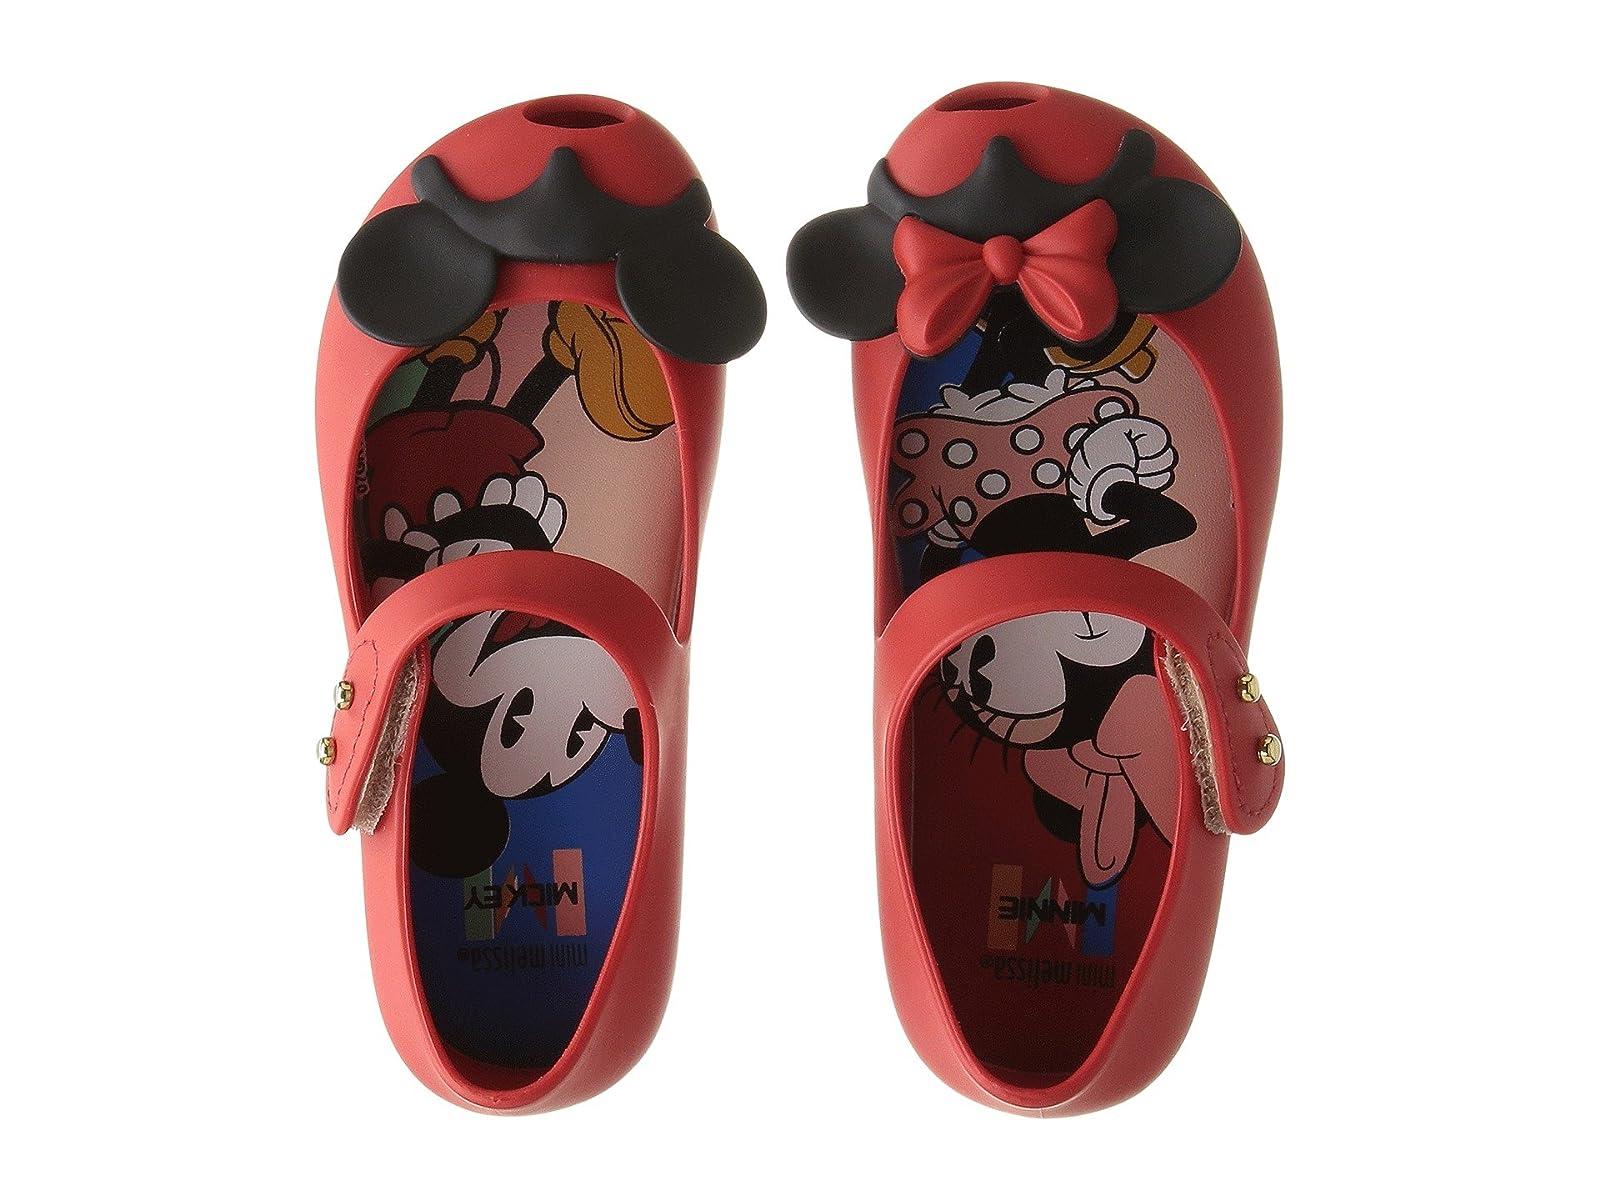 Mini Melissa Kid) Mini Ultragirl + Disney Twins II (Toddler/Little Kid) Melissa - New Style-Men's/Women's 4c89f5